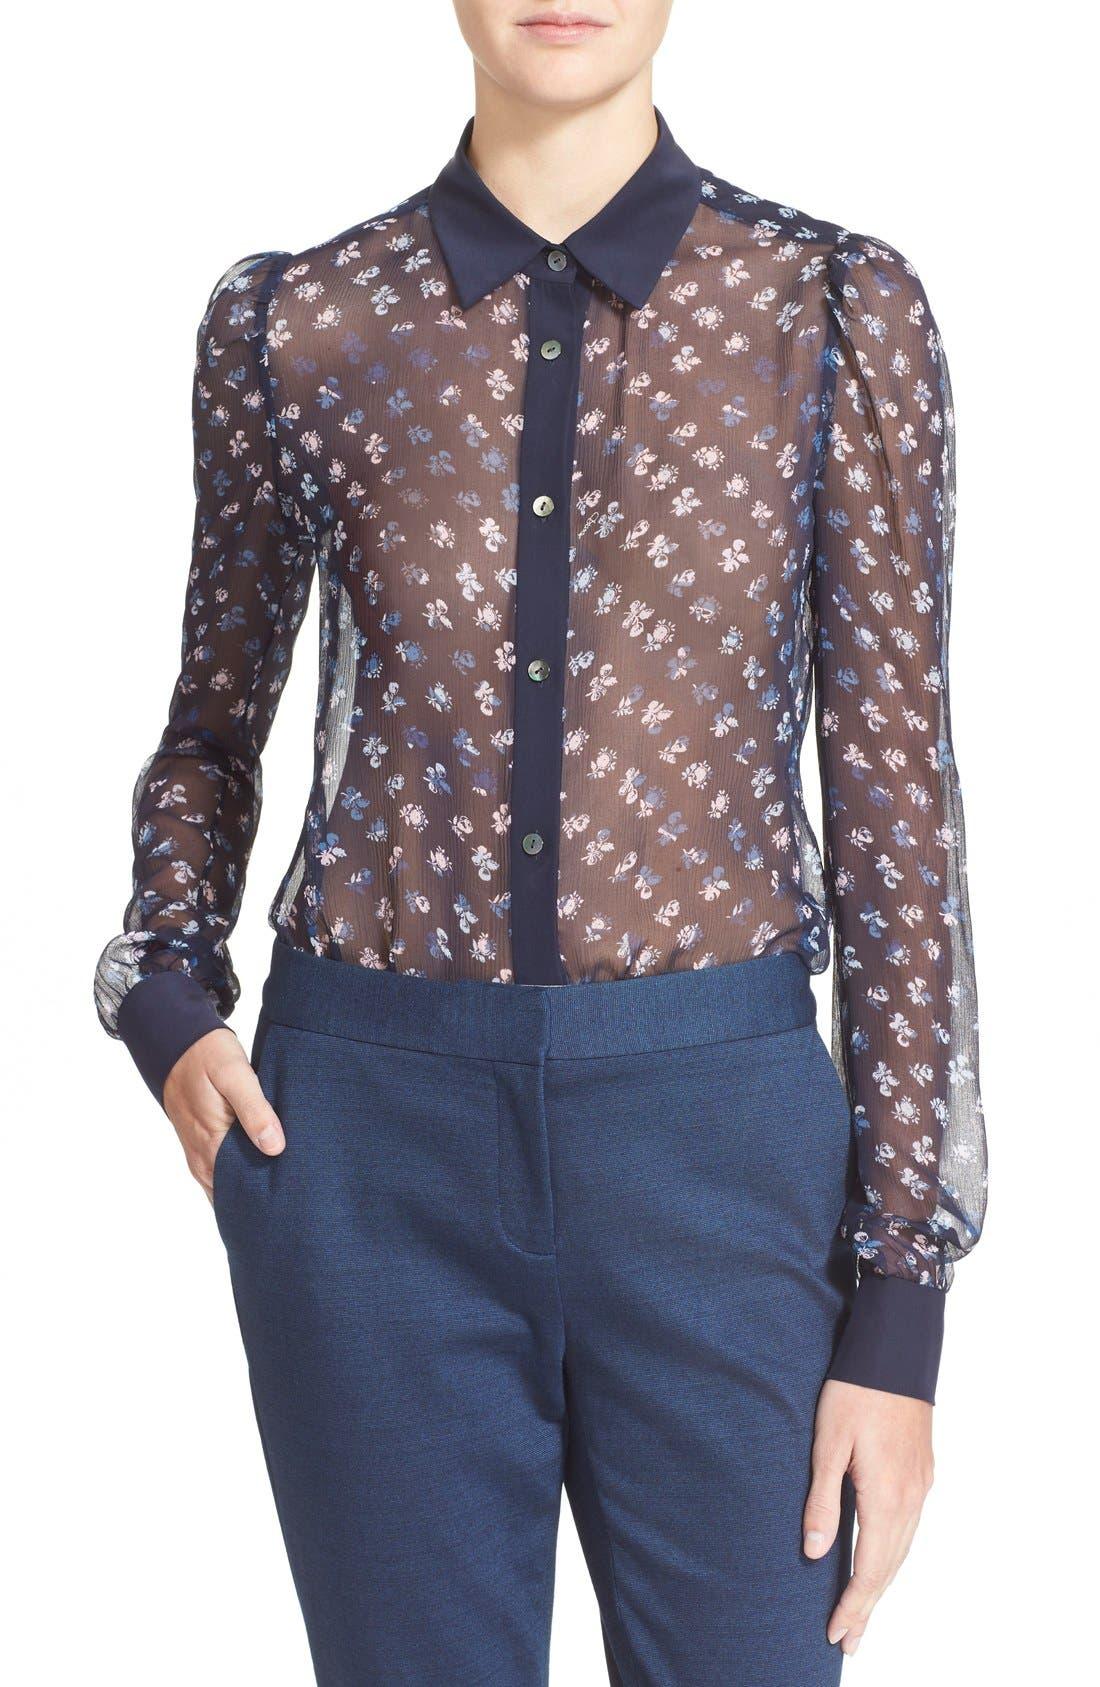 Alternate Image 1 Selected - Diane von Furstenberg 'Mariah' Floral Print Silk Blouse